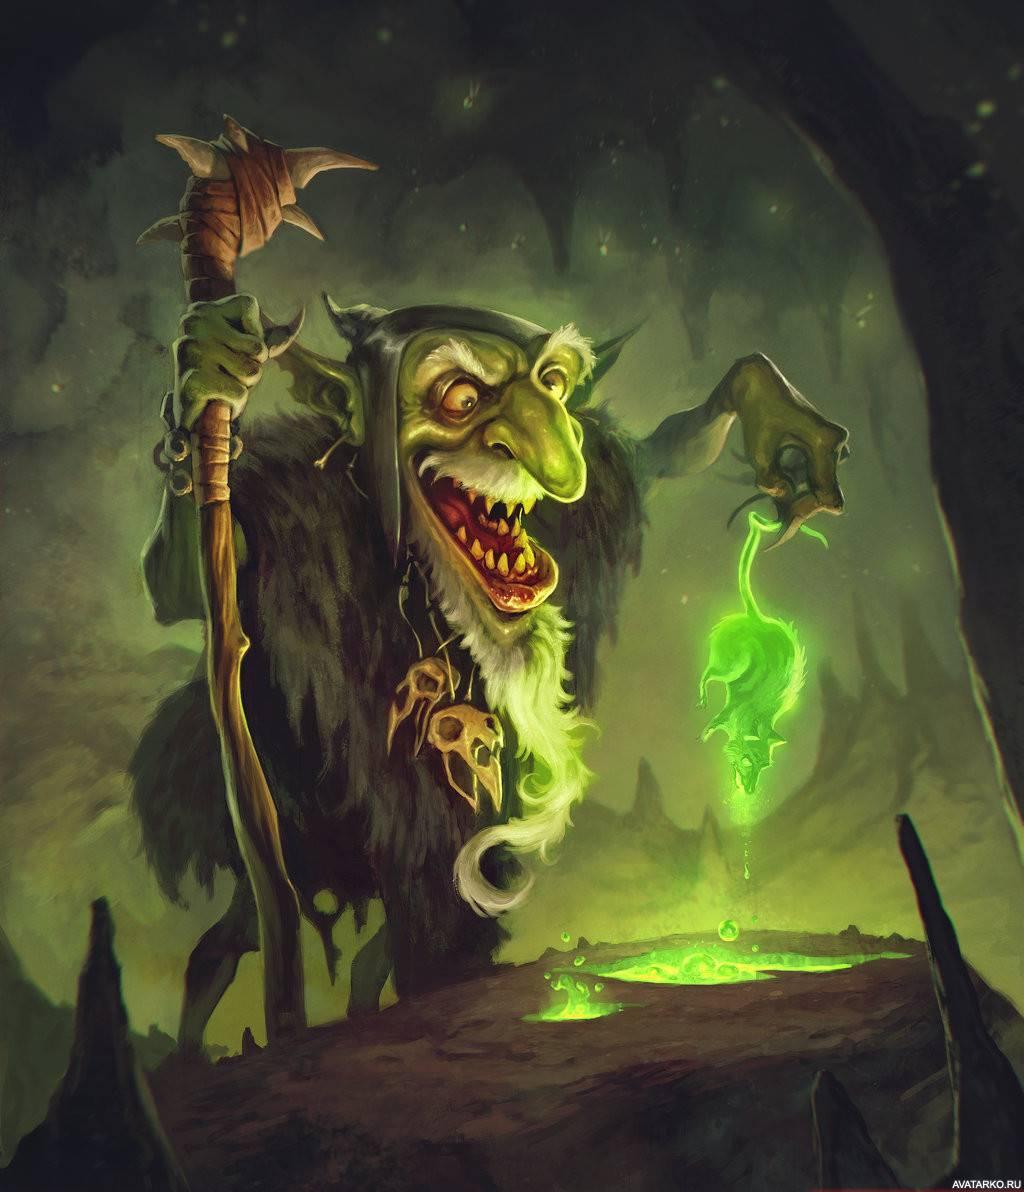 Goblin kingdom / goblin no oukoku / королевство гоблинов